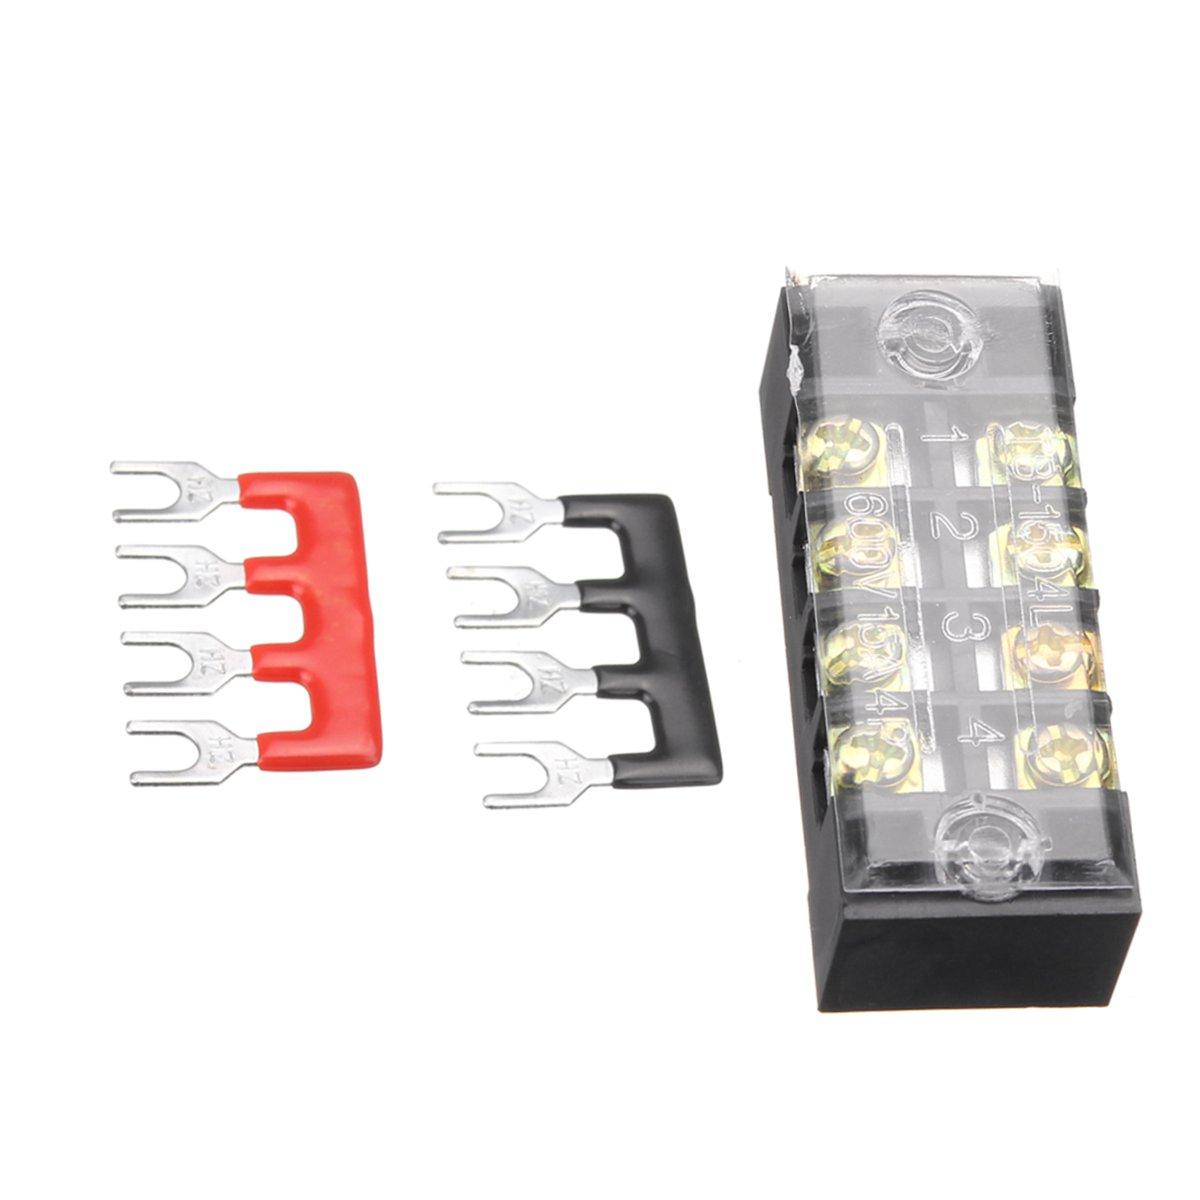 600V 15A Dual Rows 4 Position Screw Terminal Strip Red/Black Pre Insulated Terminal Block Strip